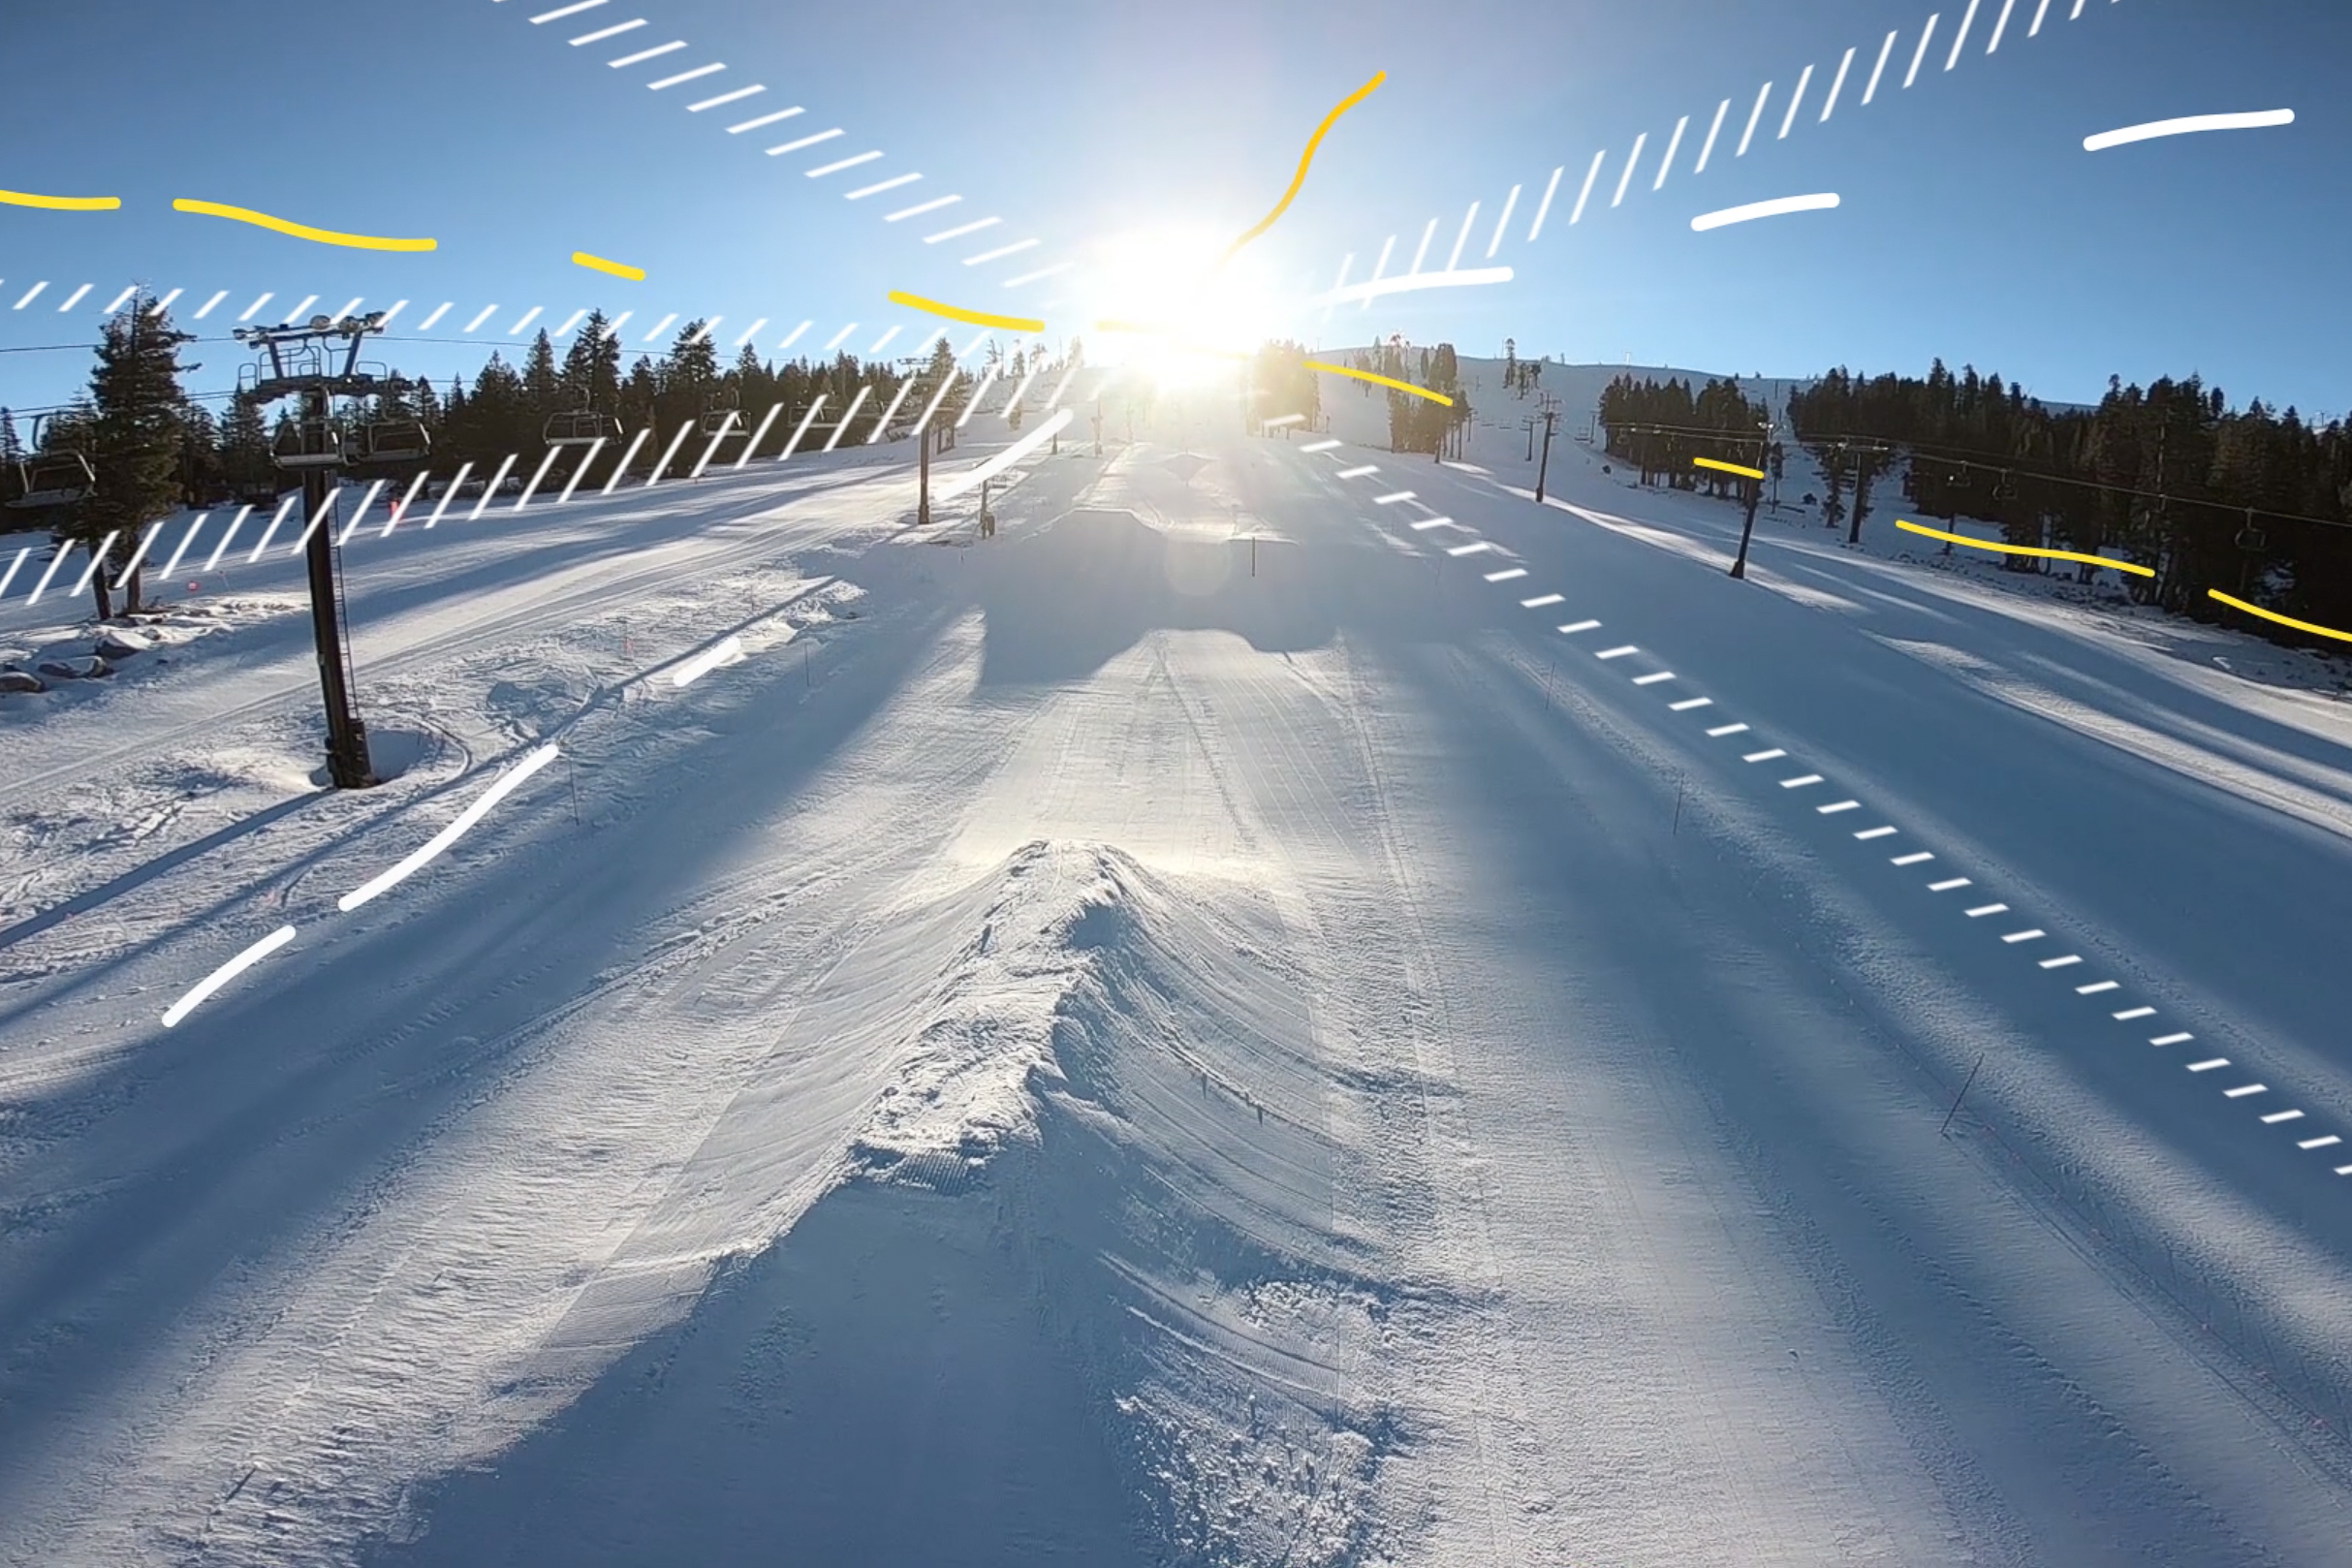 Going Solar - with Boreal Mountain